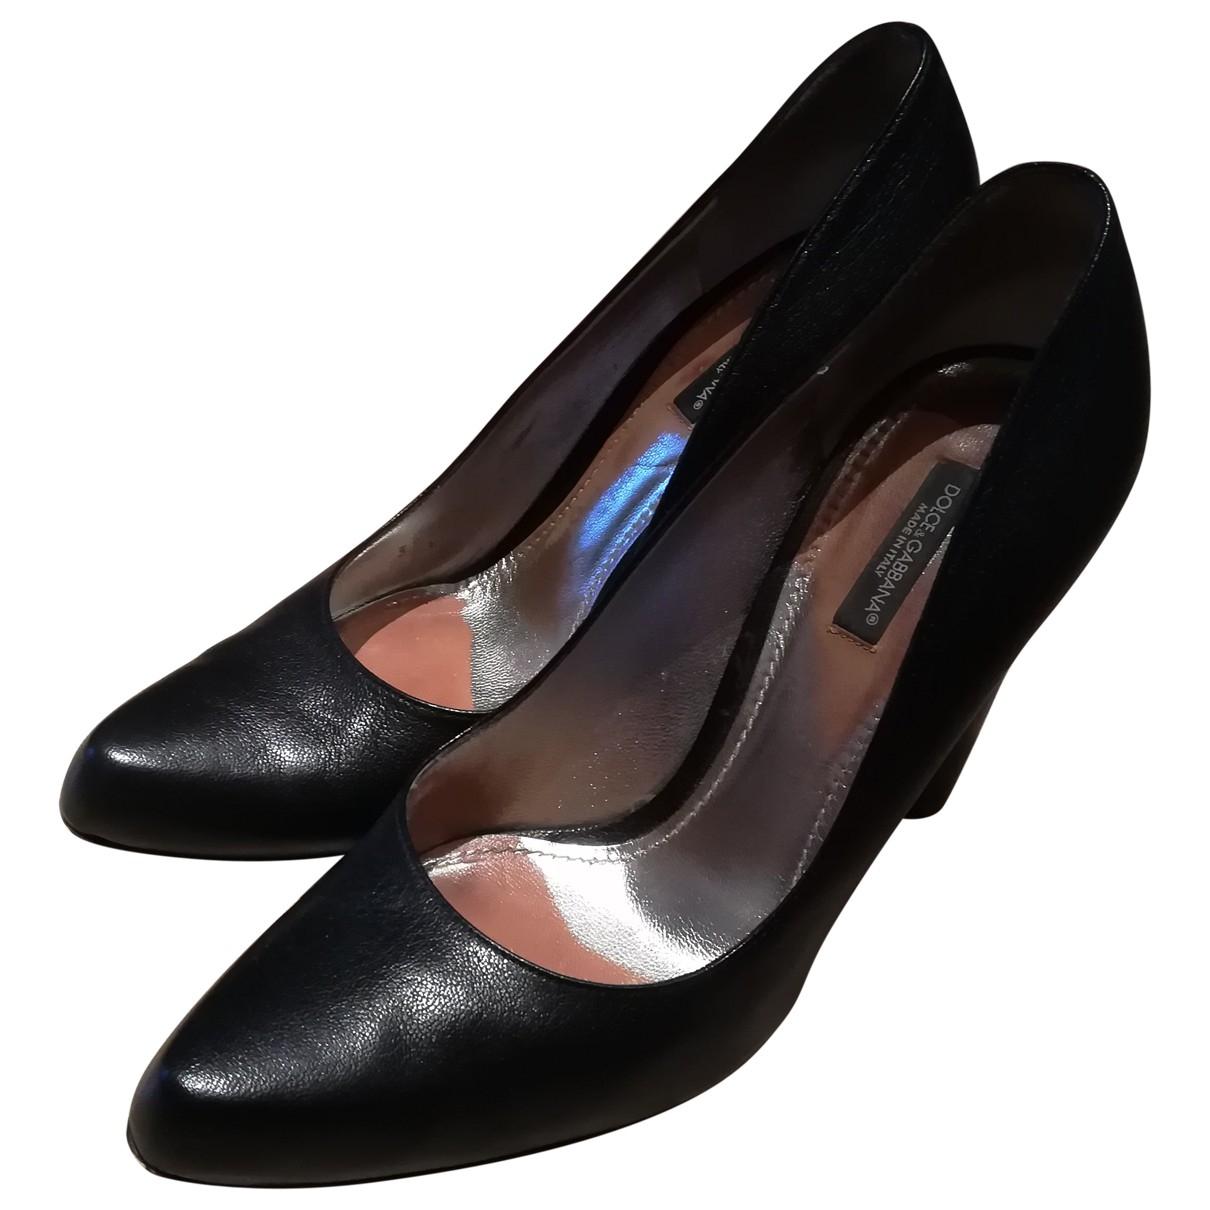 Dolce & Gabbana \N Black Leather Heels for Women 39.5 EU